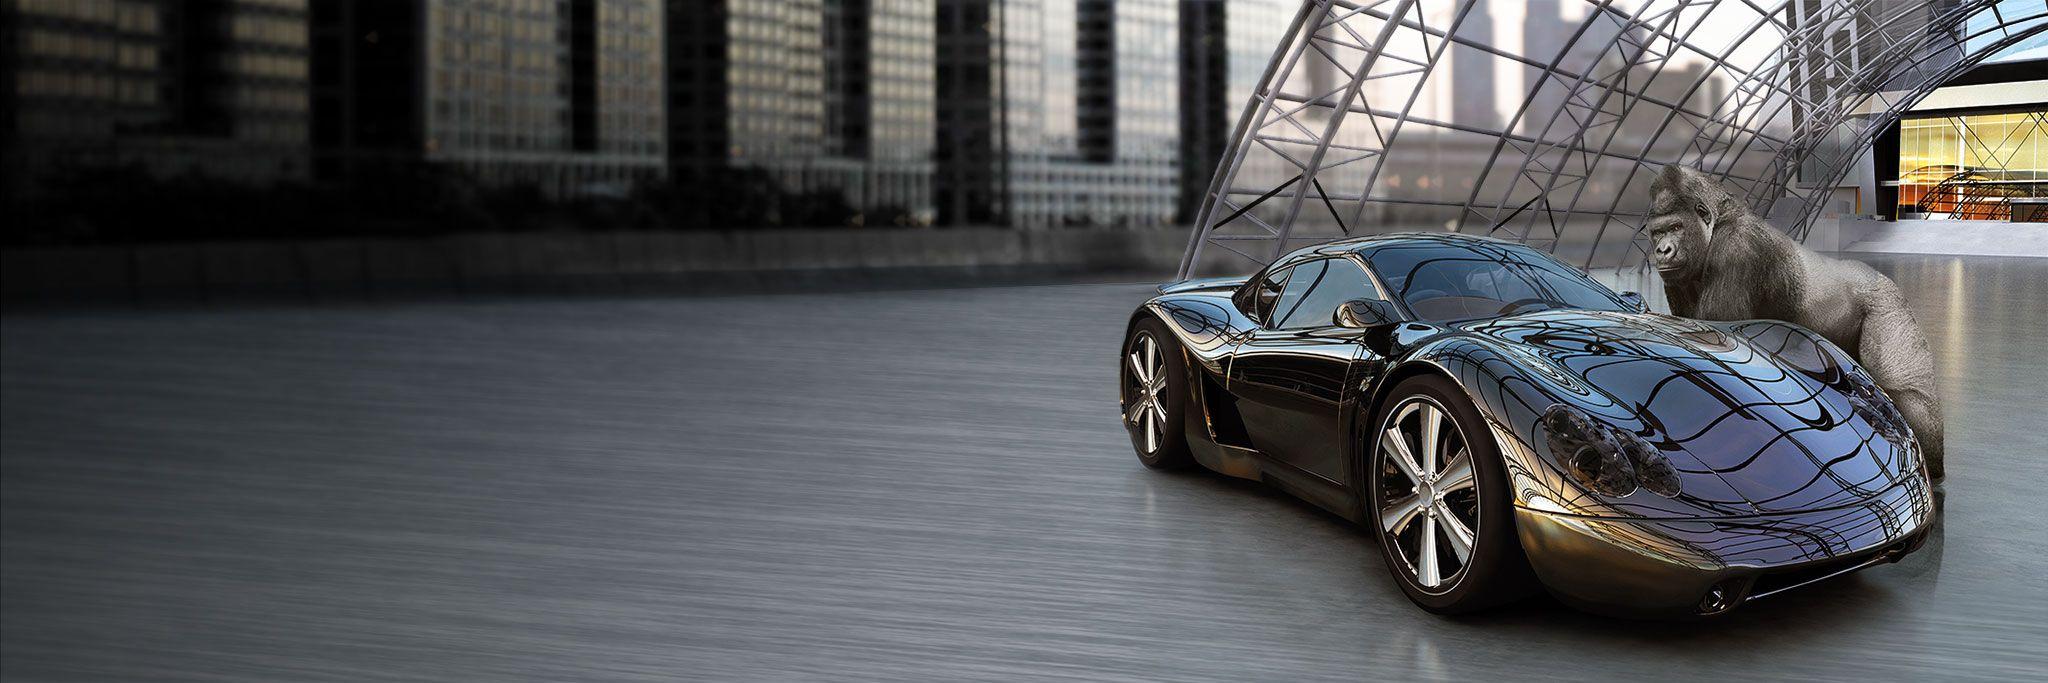 corning gorilla glass for automotive - Automotive Glass